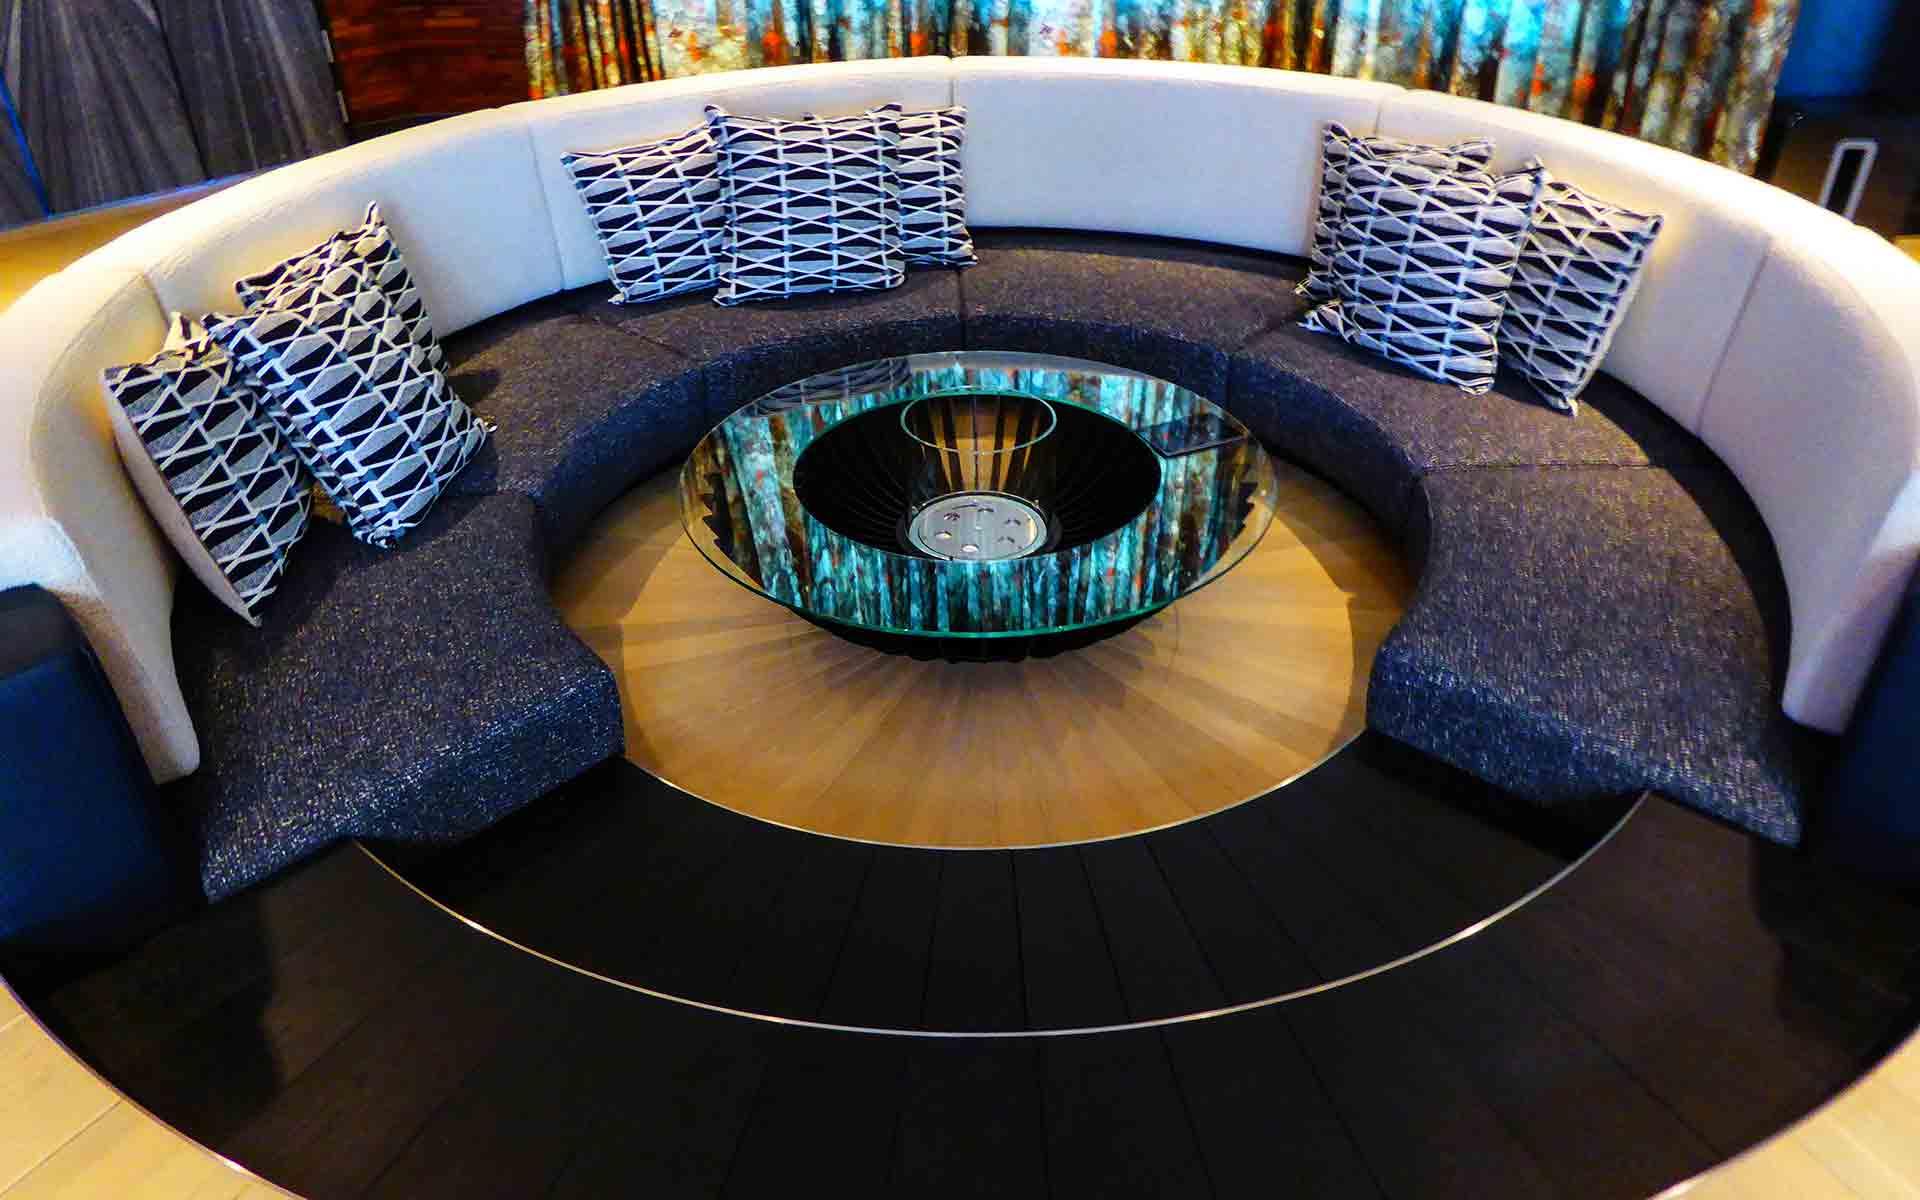 Finished revolving Mayfair sofa